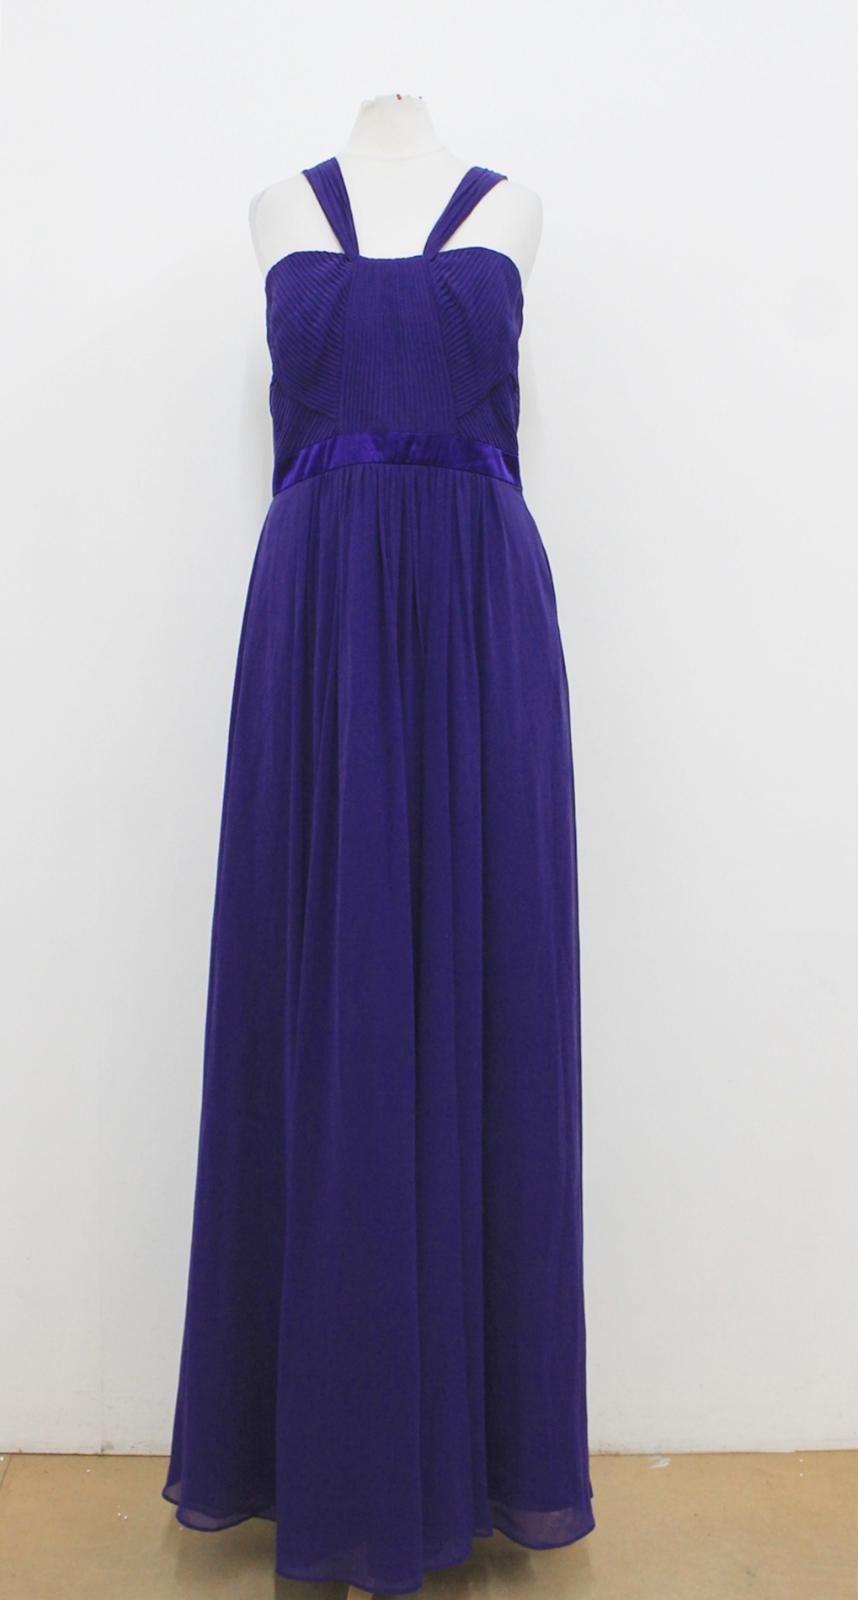 BNWT COAST Ladies Dark lila Pleated Sleeveless Evening Maxi Dress UK12